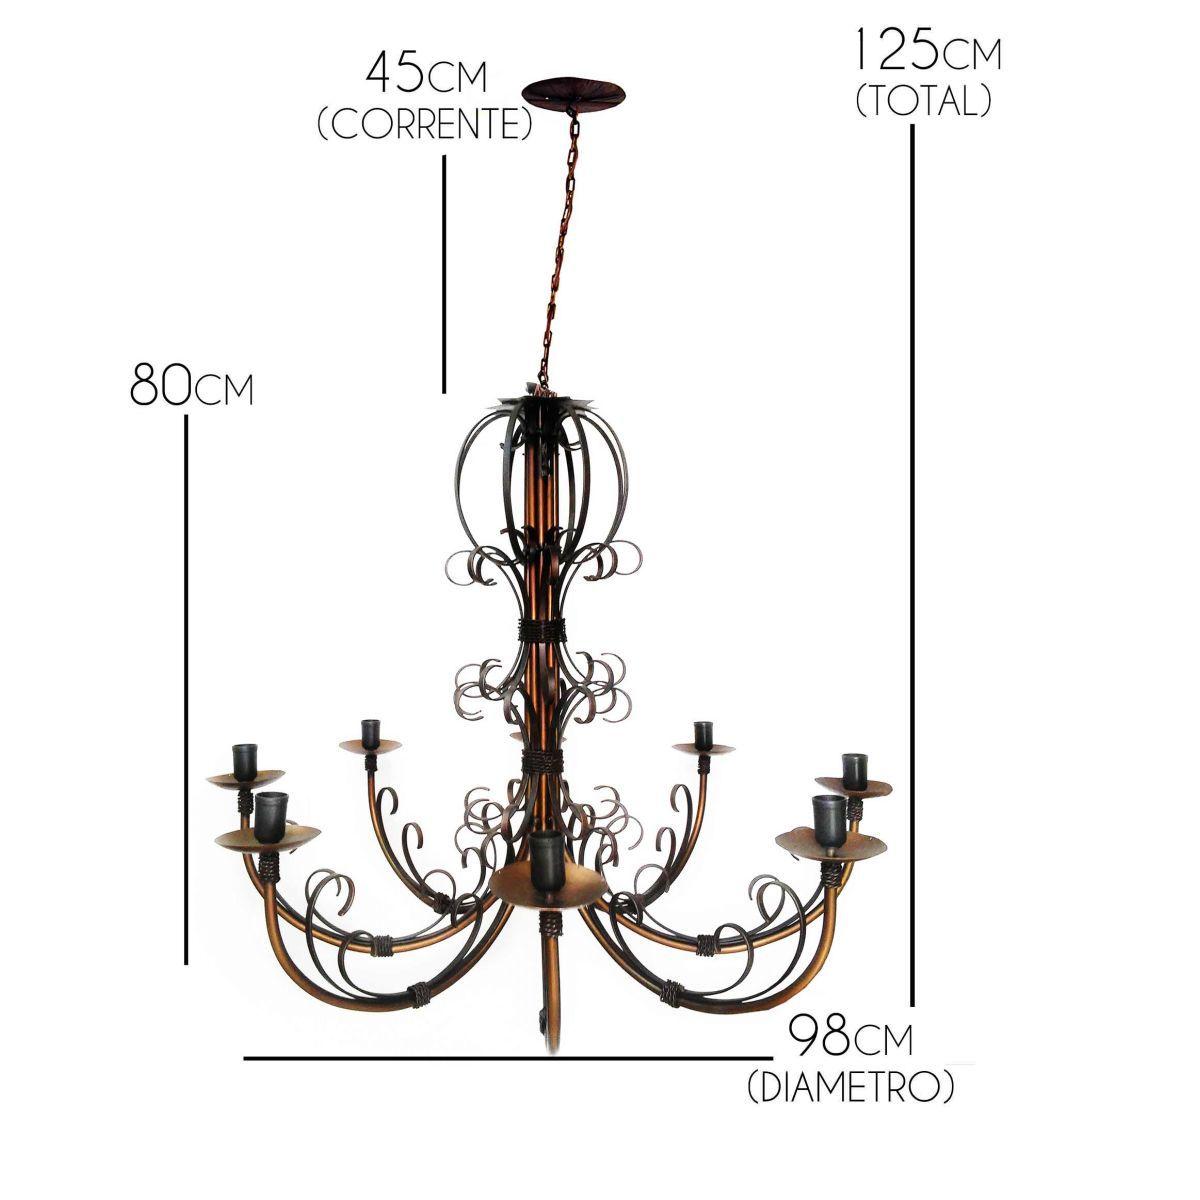 Luminaria De Ferro Artesanal Para Sala Estar Rustica para 8 Lâmpadas